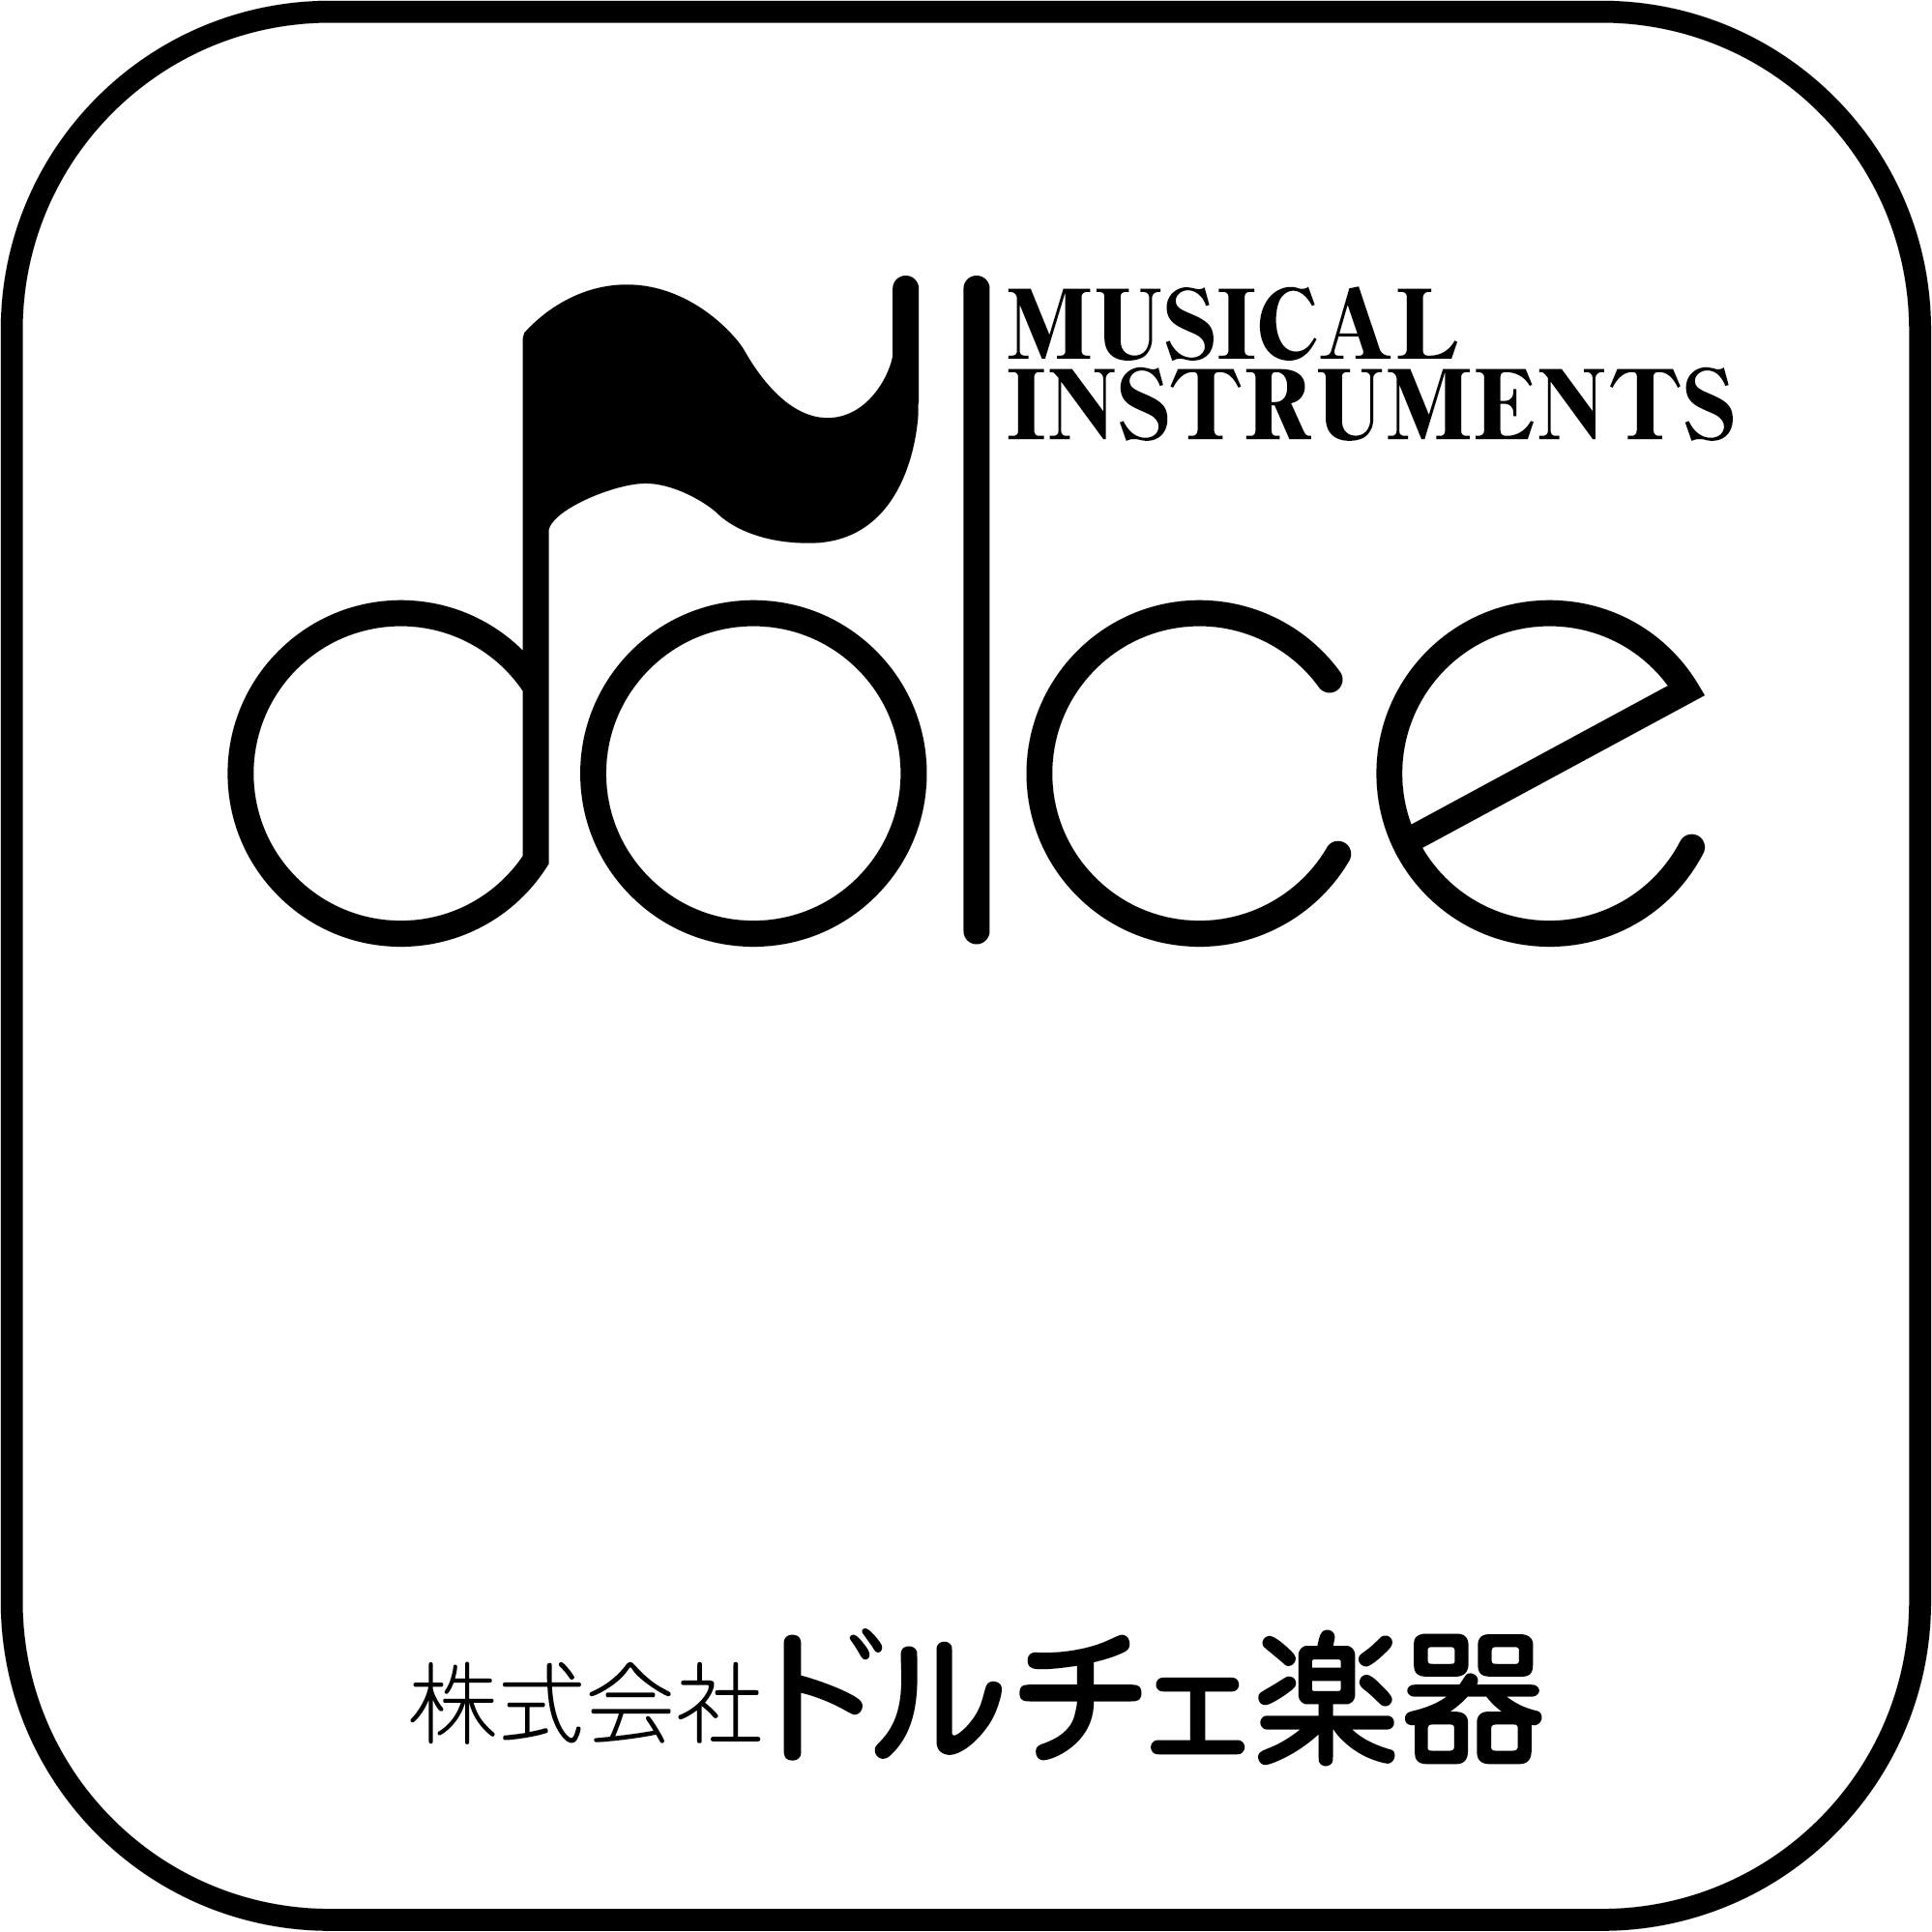 Dolce Music - Japan